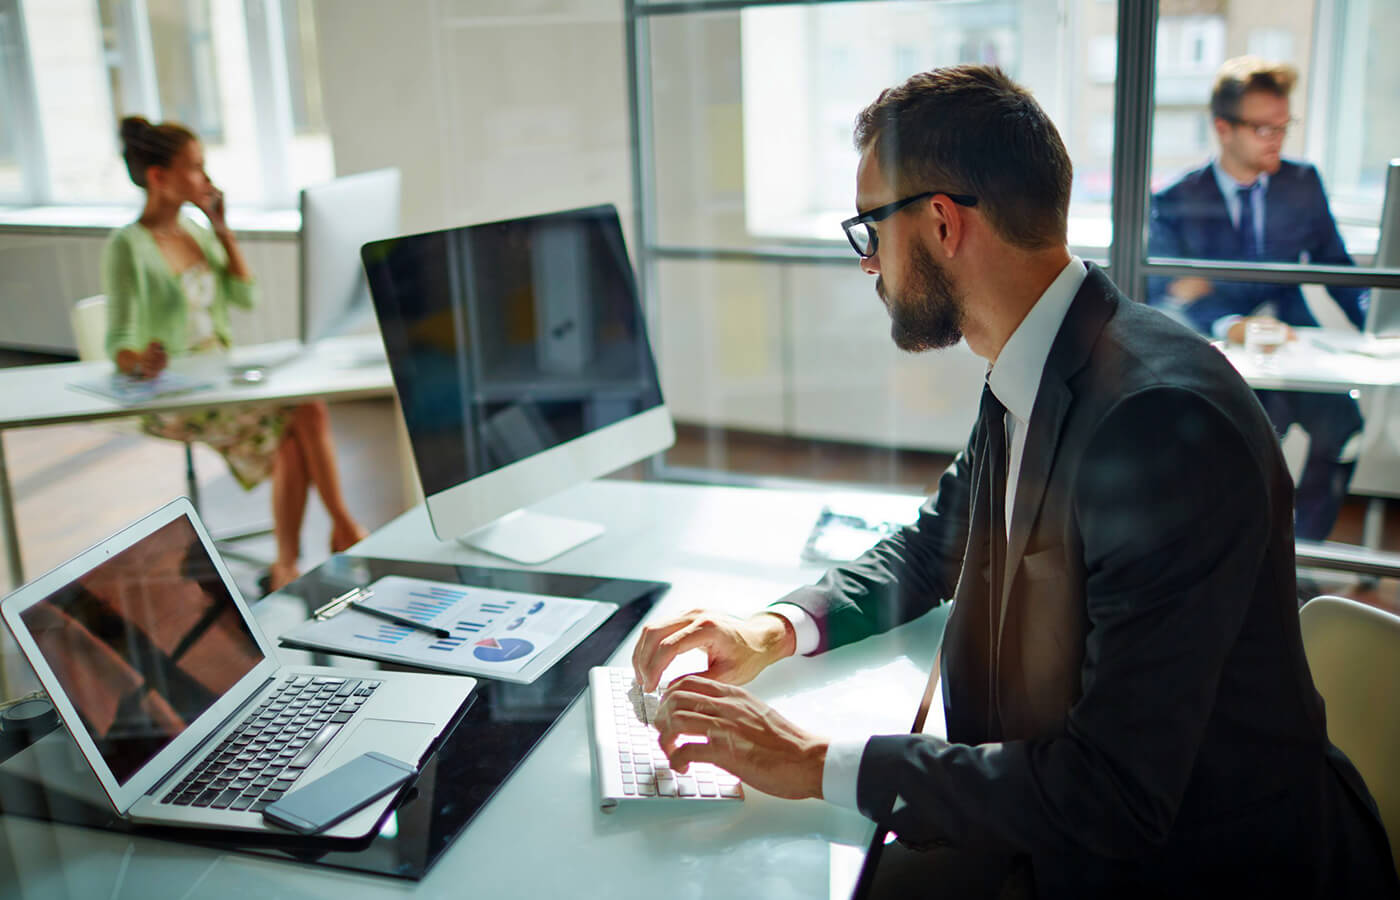 cloud-based HR software transactional work